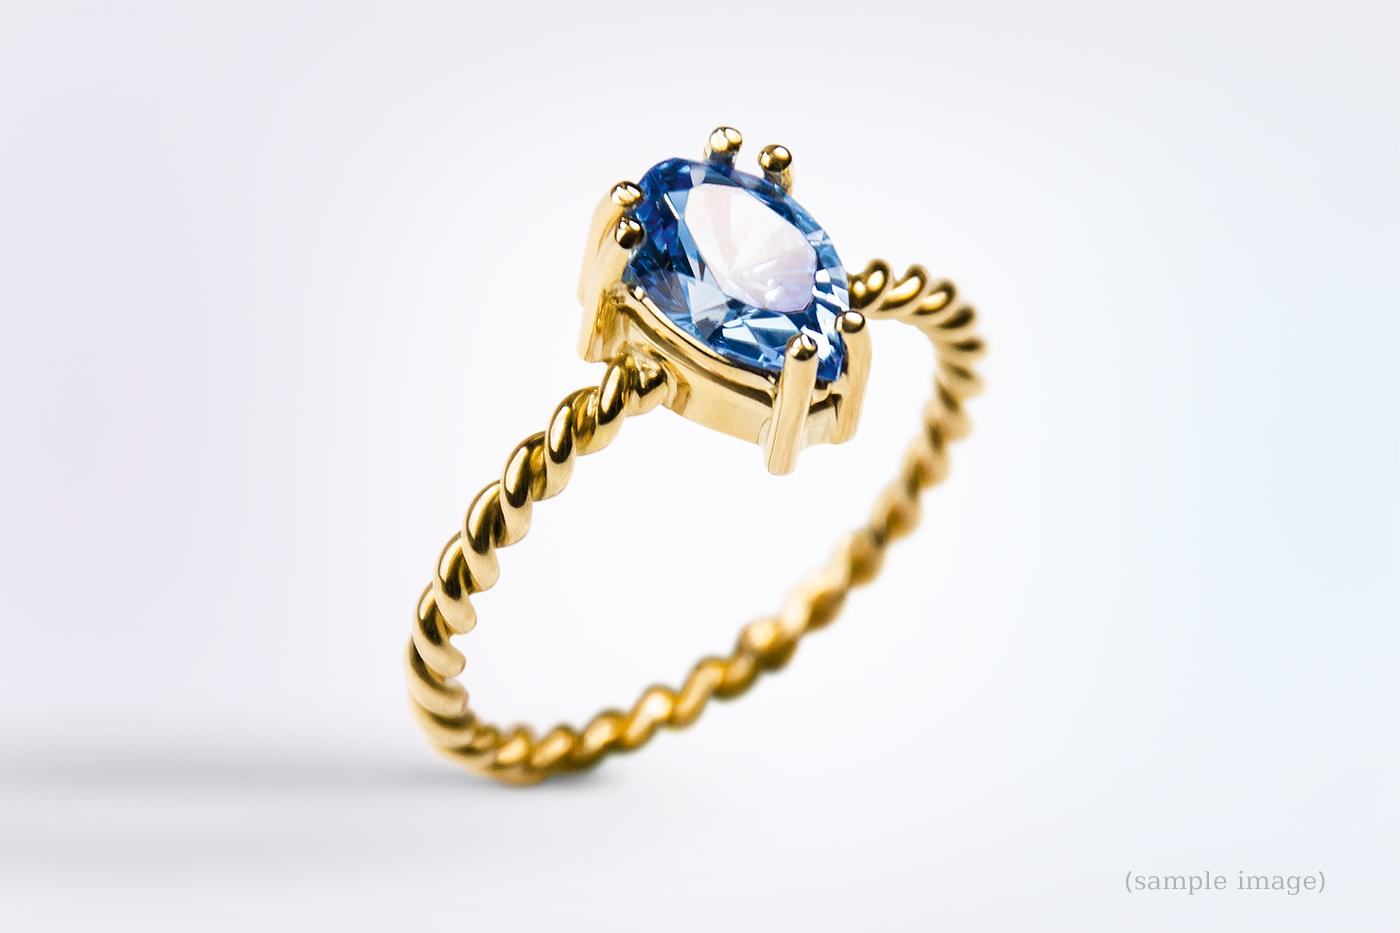 800-Ring gelbgold Edelsteinfarbe blau